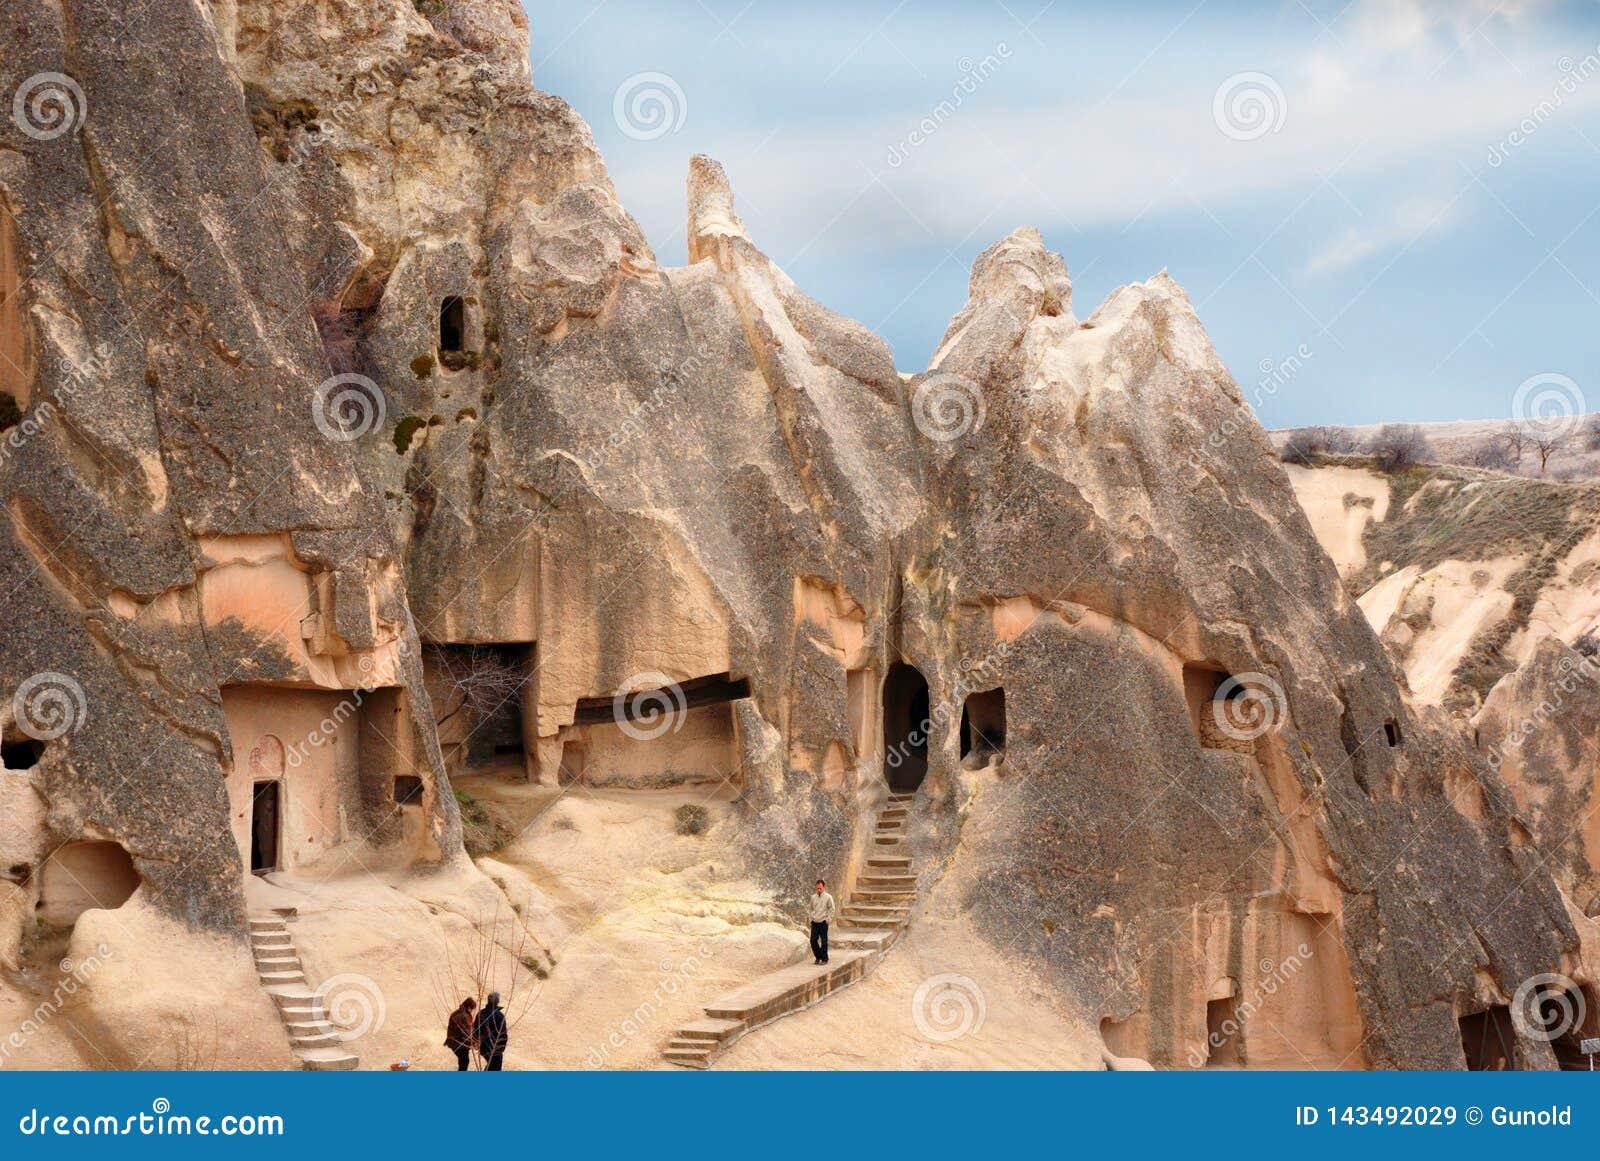 Höhlenhäuser in Cappadocia, die Türkei